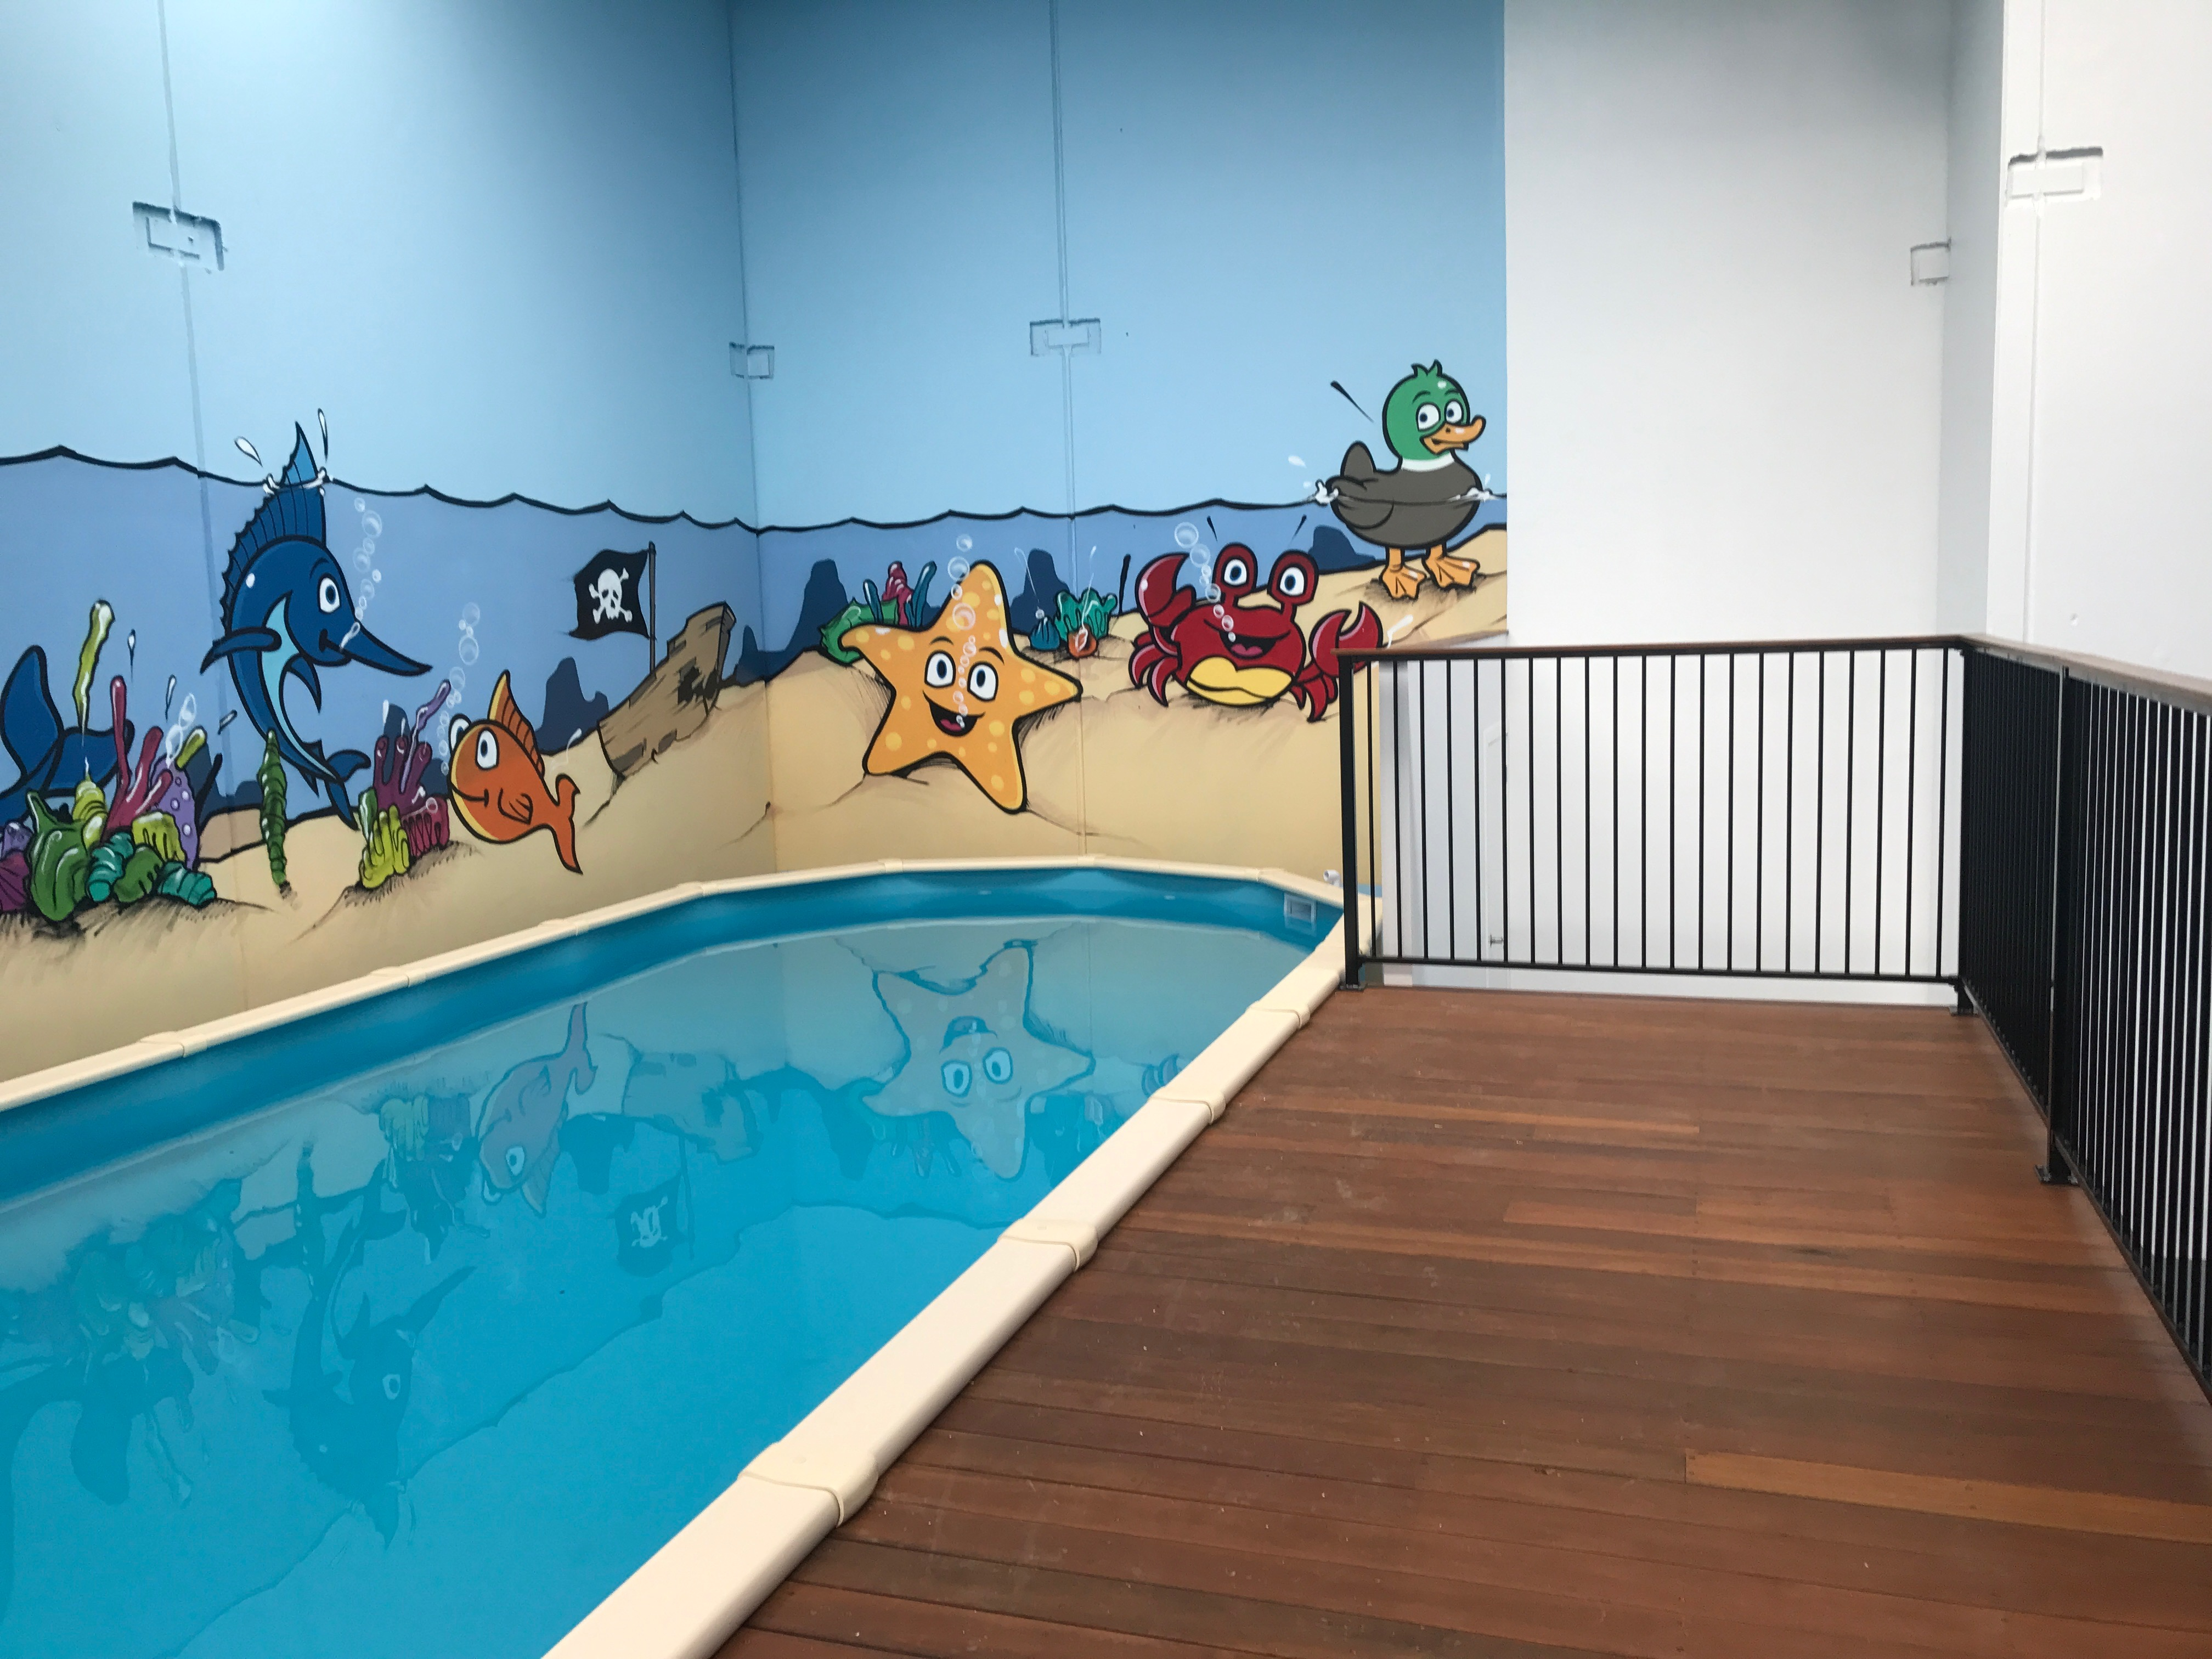 JUMP! Swim Schools Hoppers Crossing   4/15 Lentini Street, Hoppers Crossing, Victoria 3029   +61 3 9369 9438